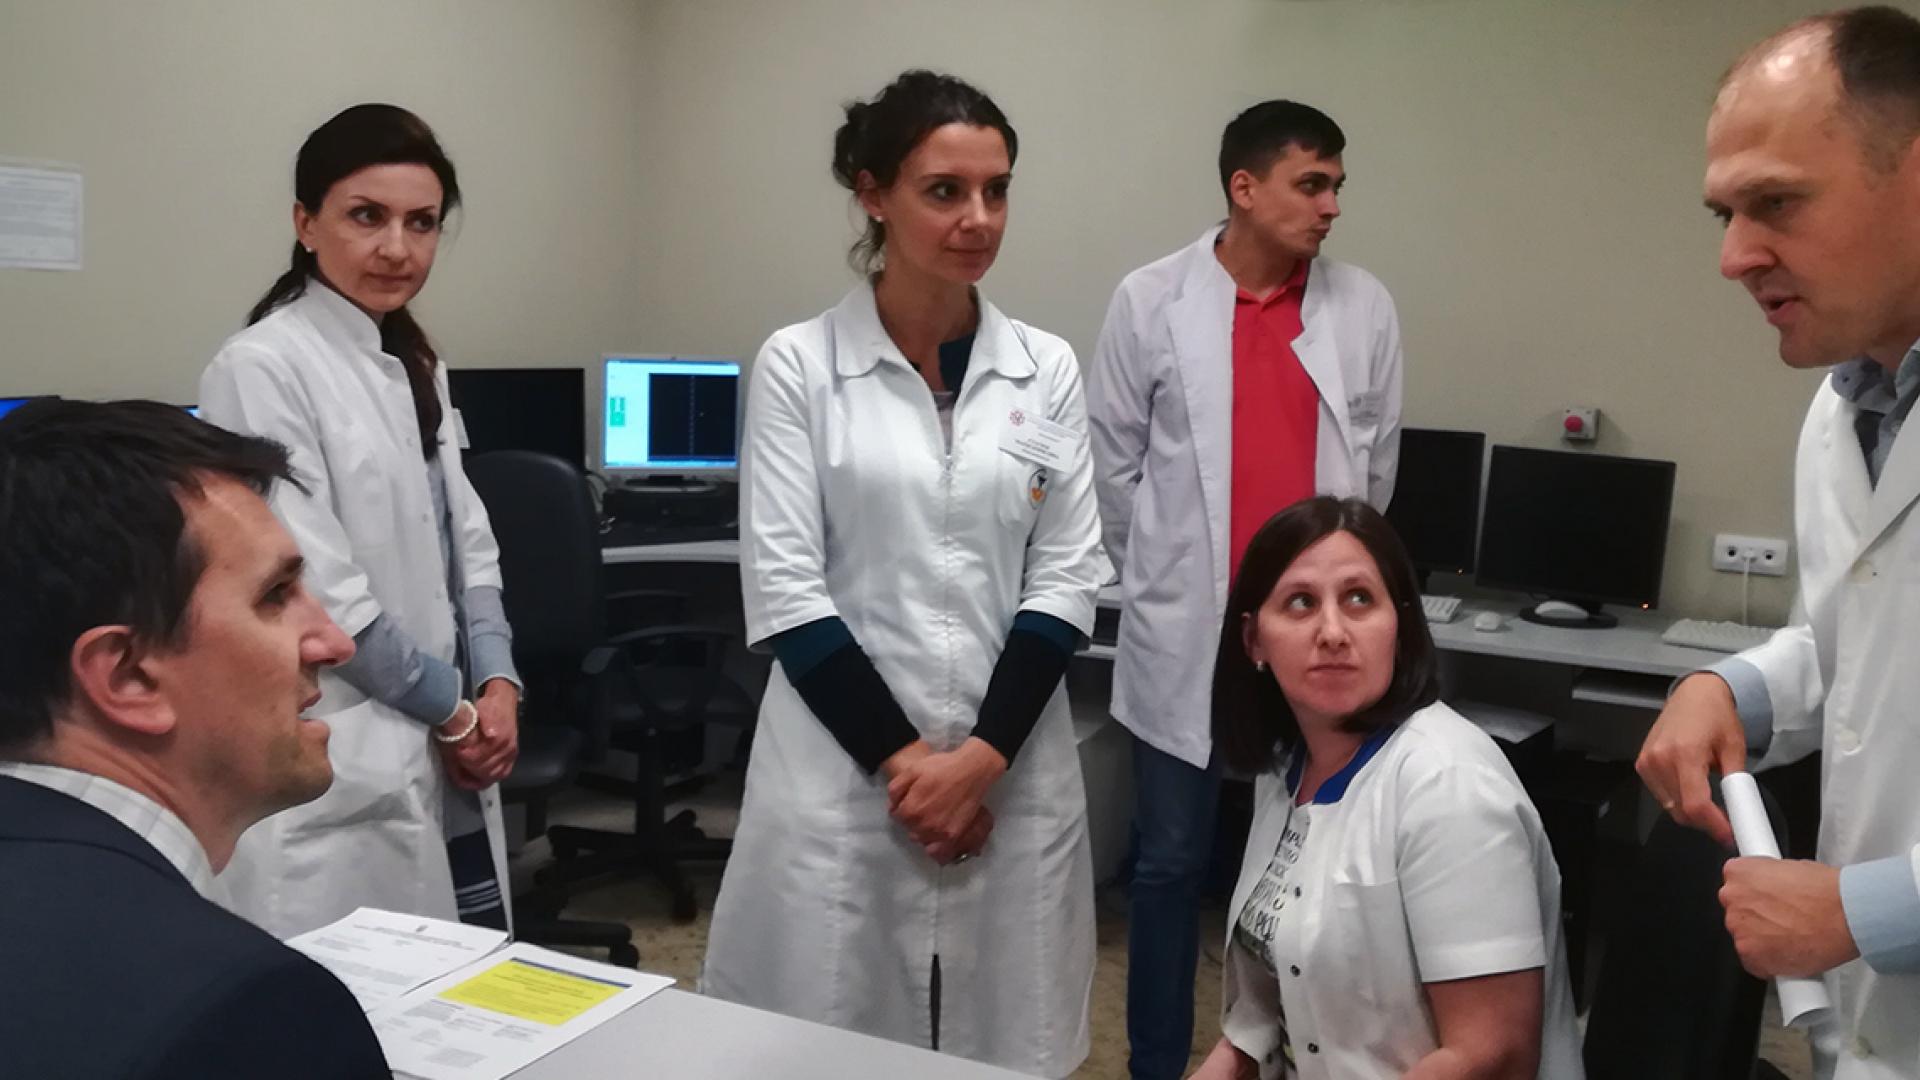 IAEA Leads Review of Ukraine's Cancer Control Programme | IAEA